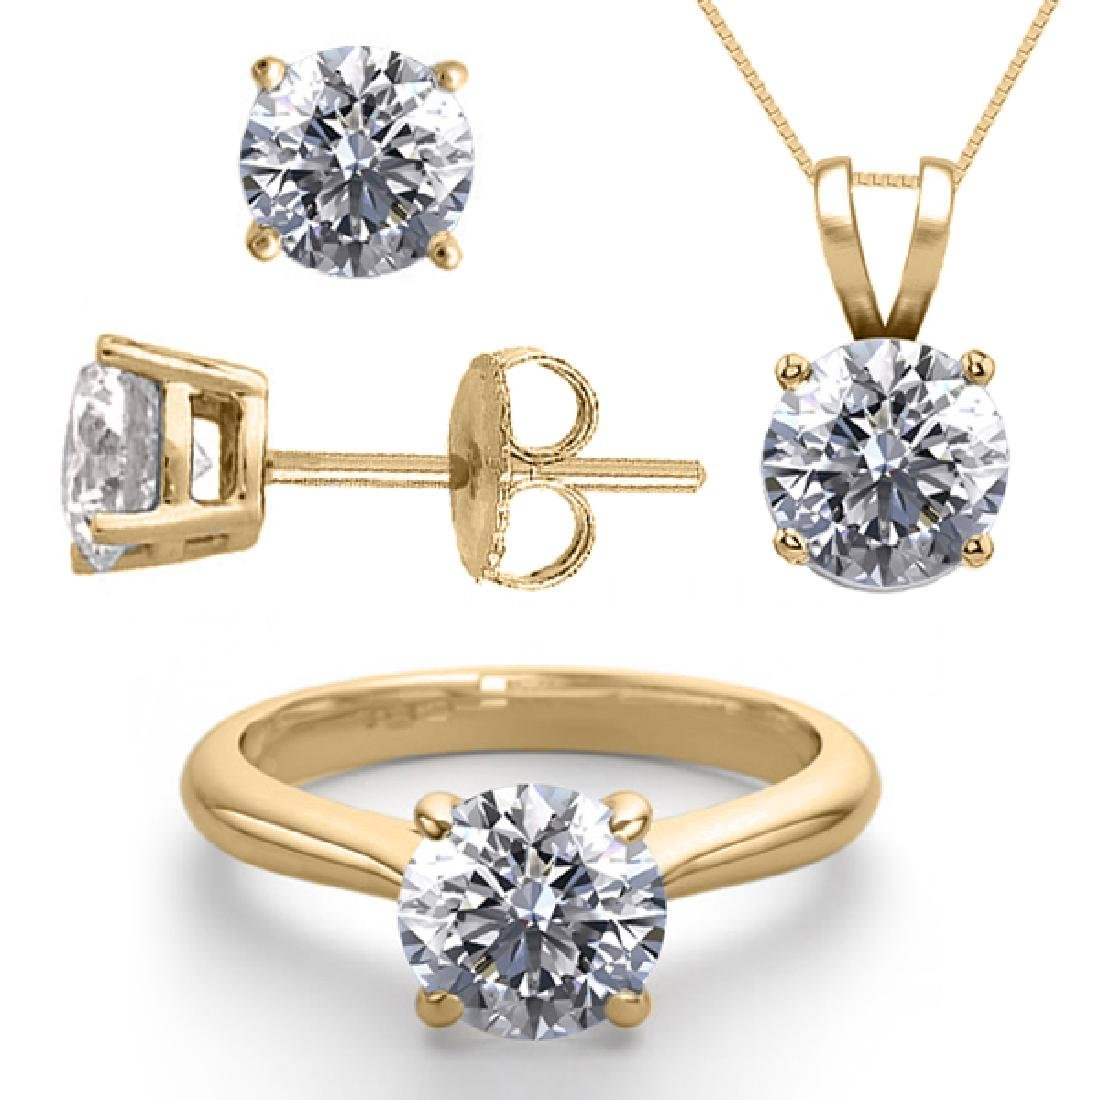 14K Yellow Gold SET 3.0CTW Natural Diamond Ring,